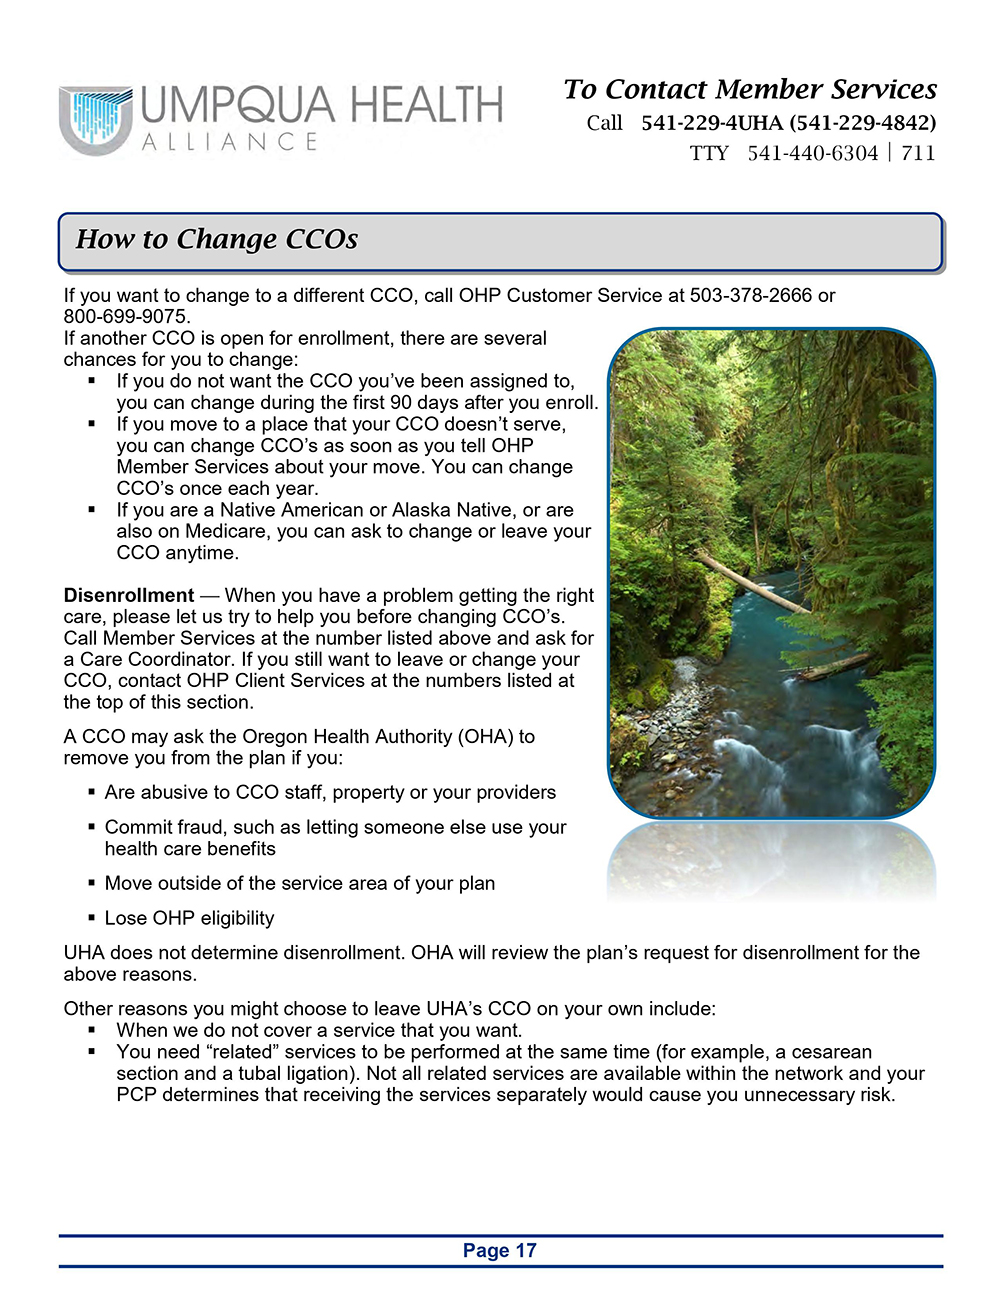 Member Handbook - Page 17